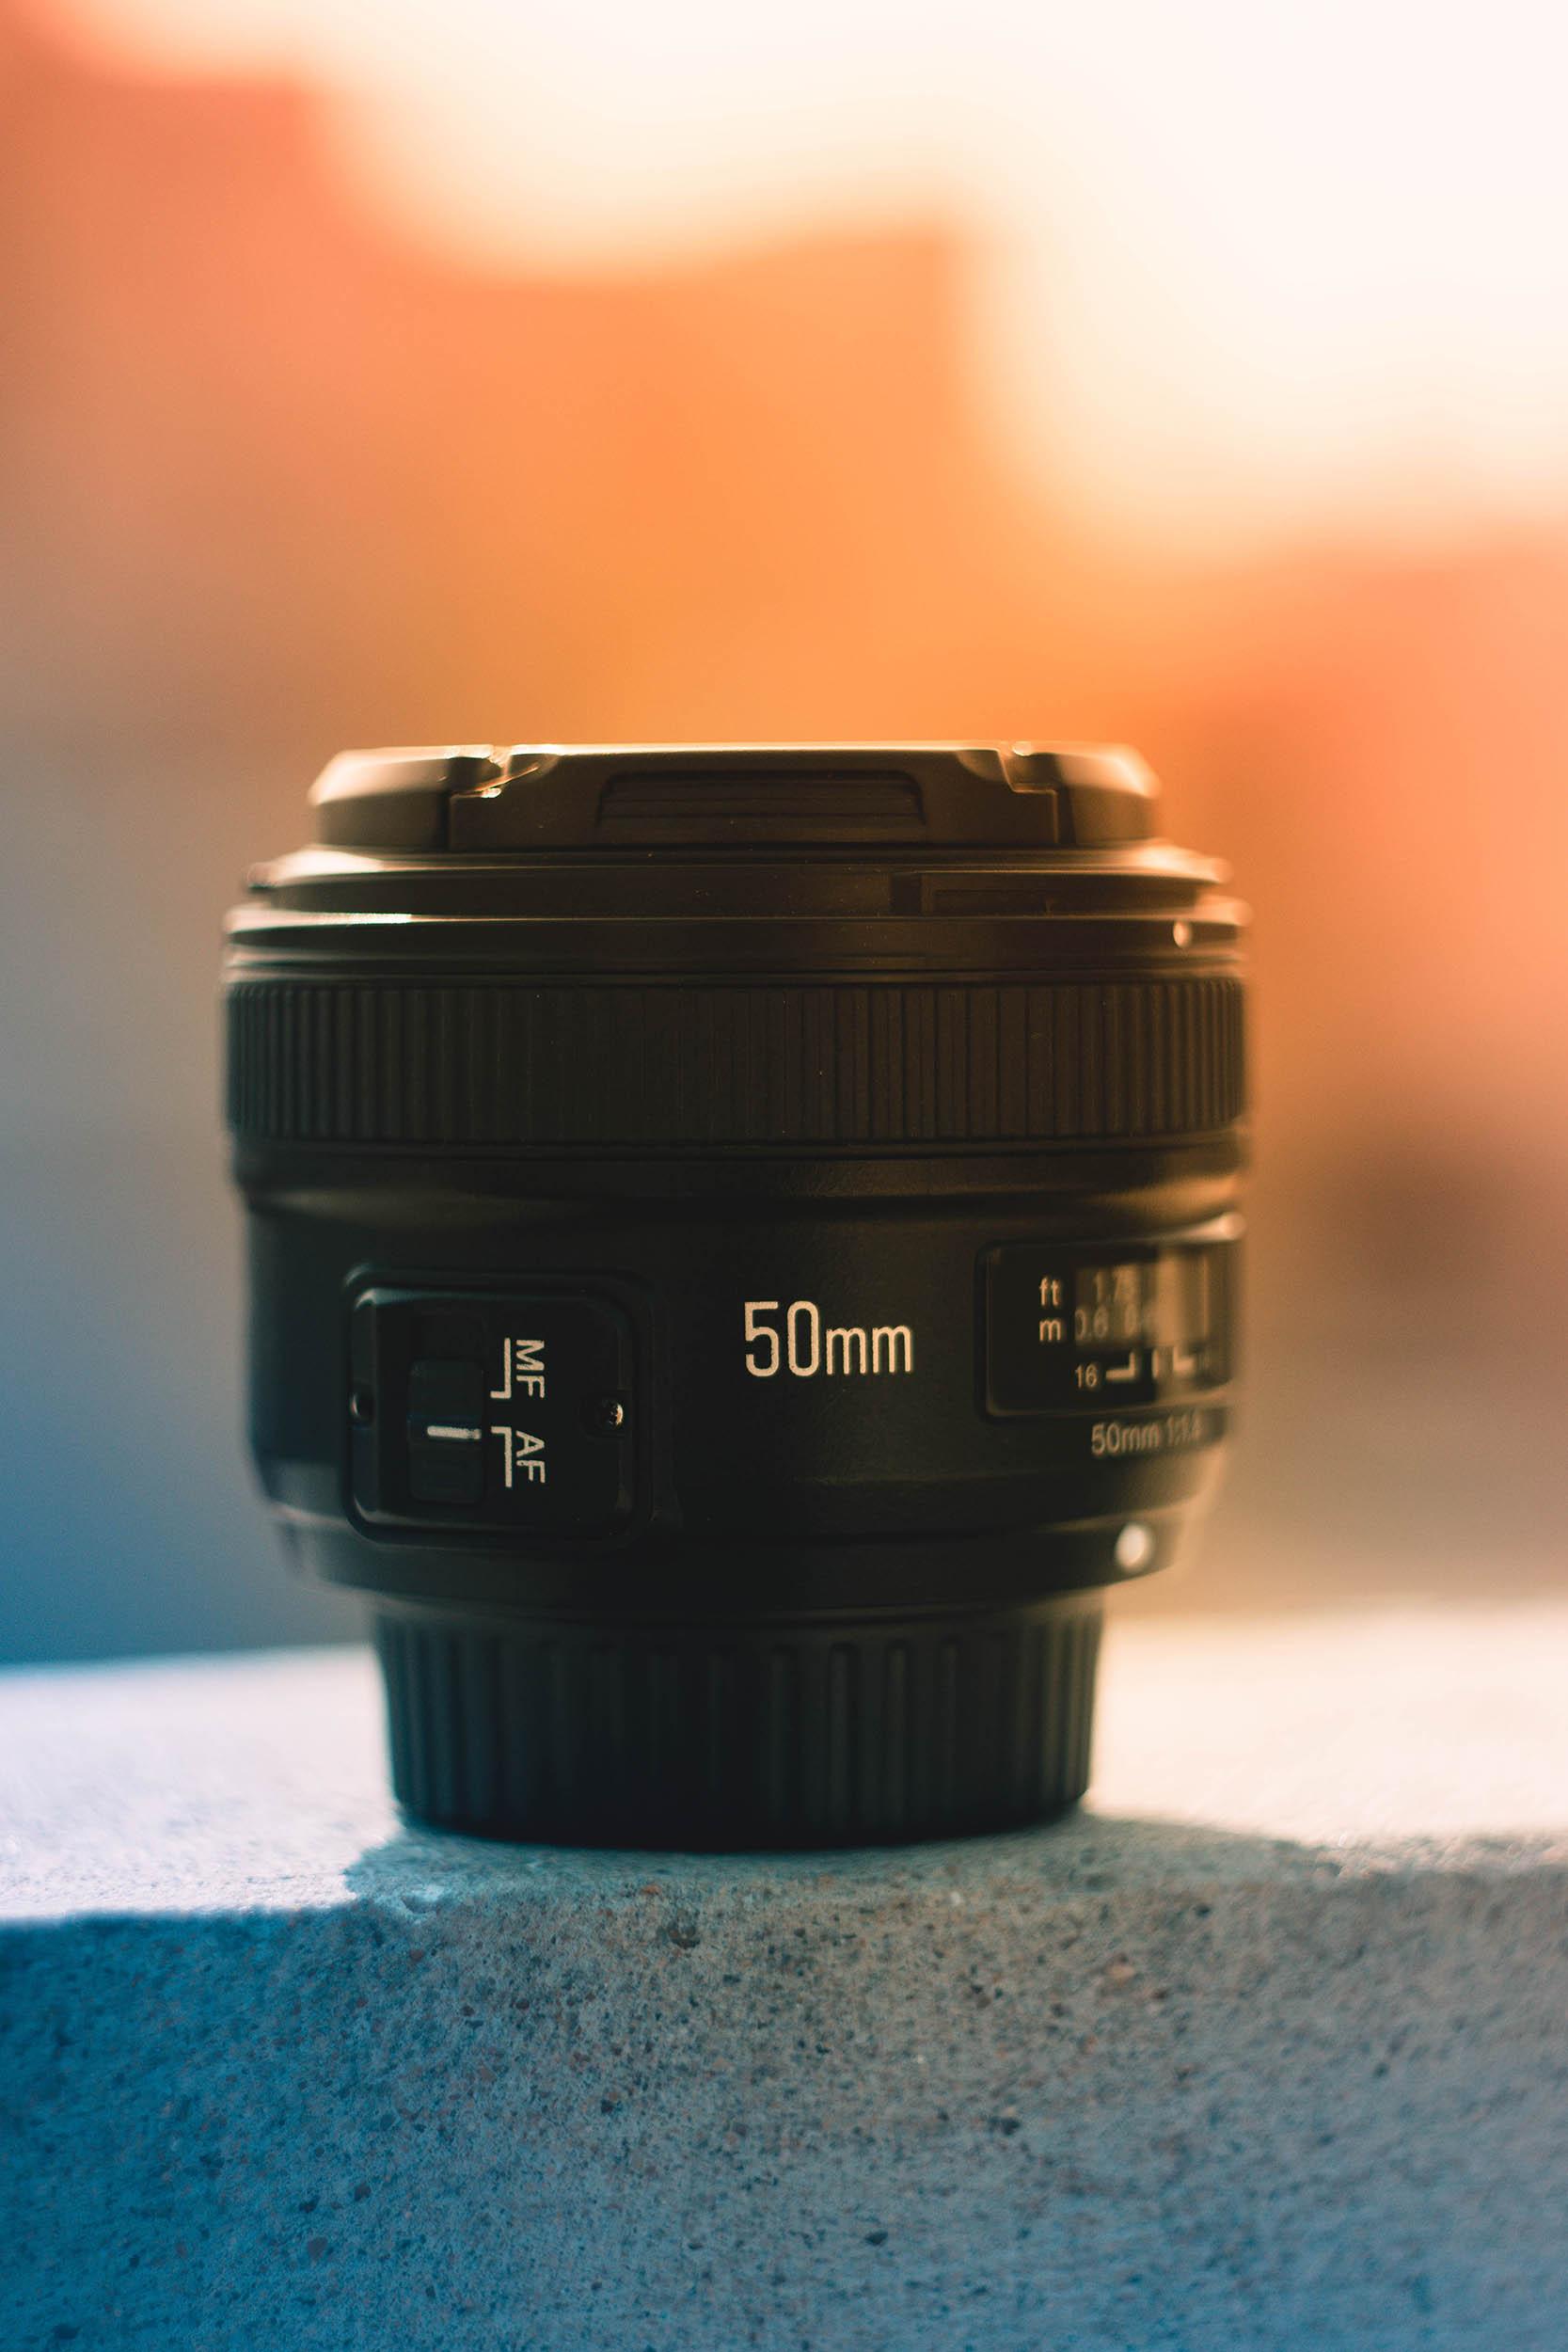 50mm ps blog 01 Photography Basics Portrait photography Basics every photographer should know